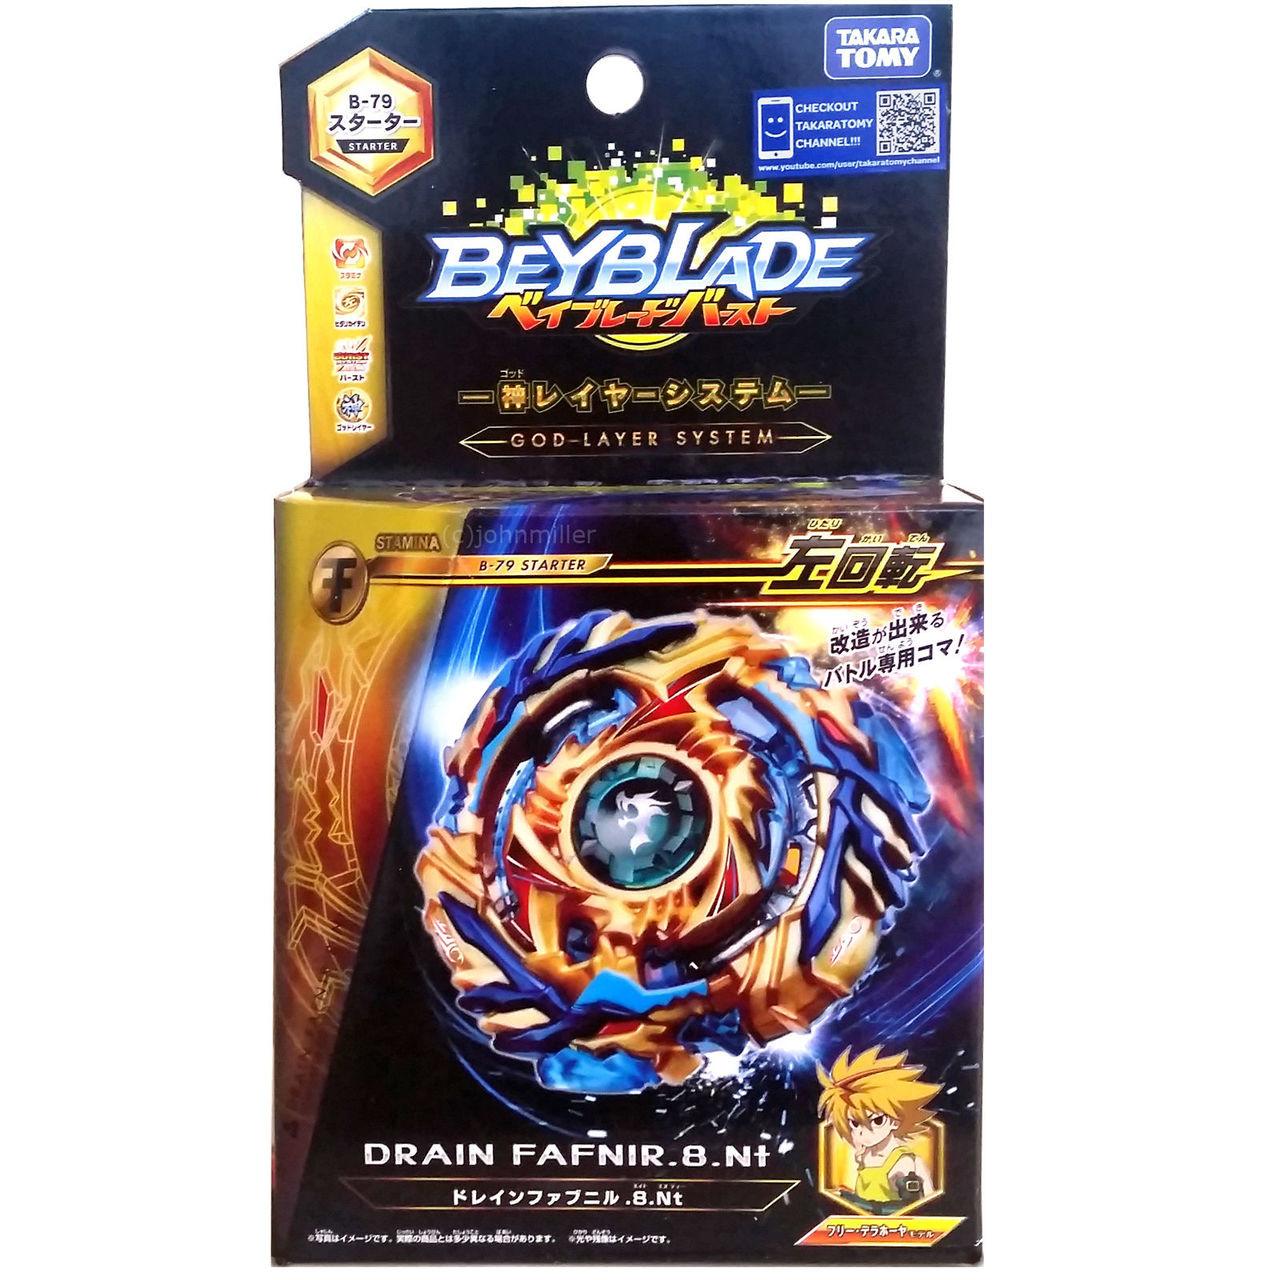 Details about  /Beyblade Burst B-79 Drain Fafnir.8.Nt Starter w// Launcher Kids Christmas Gift